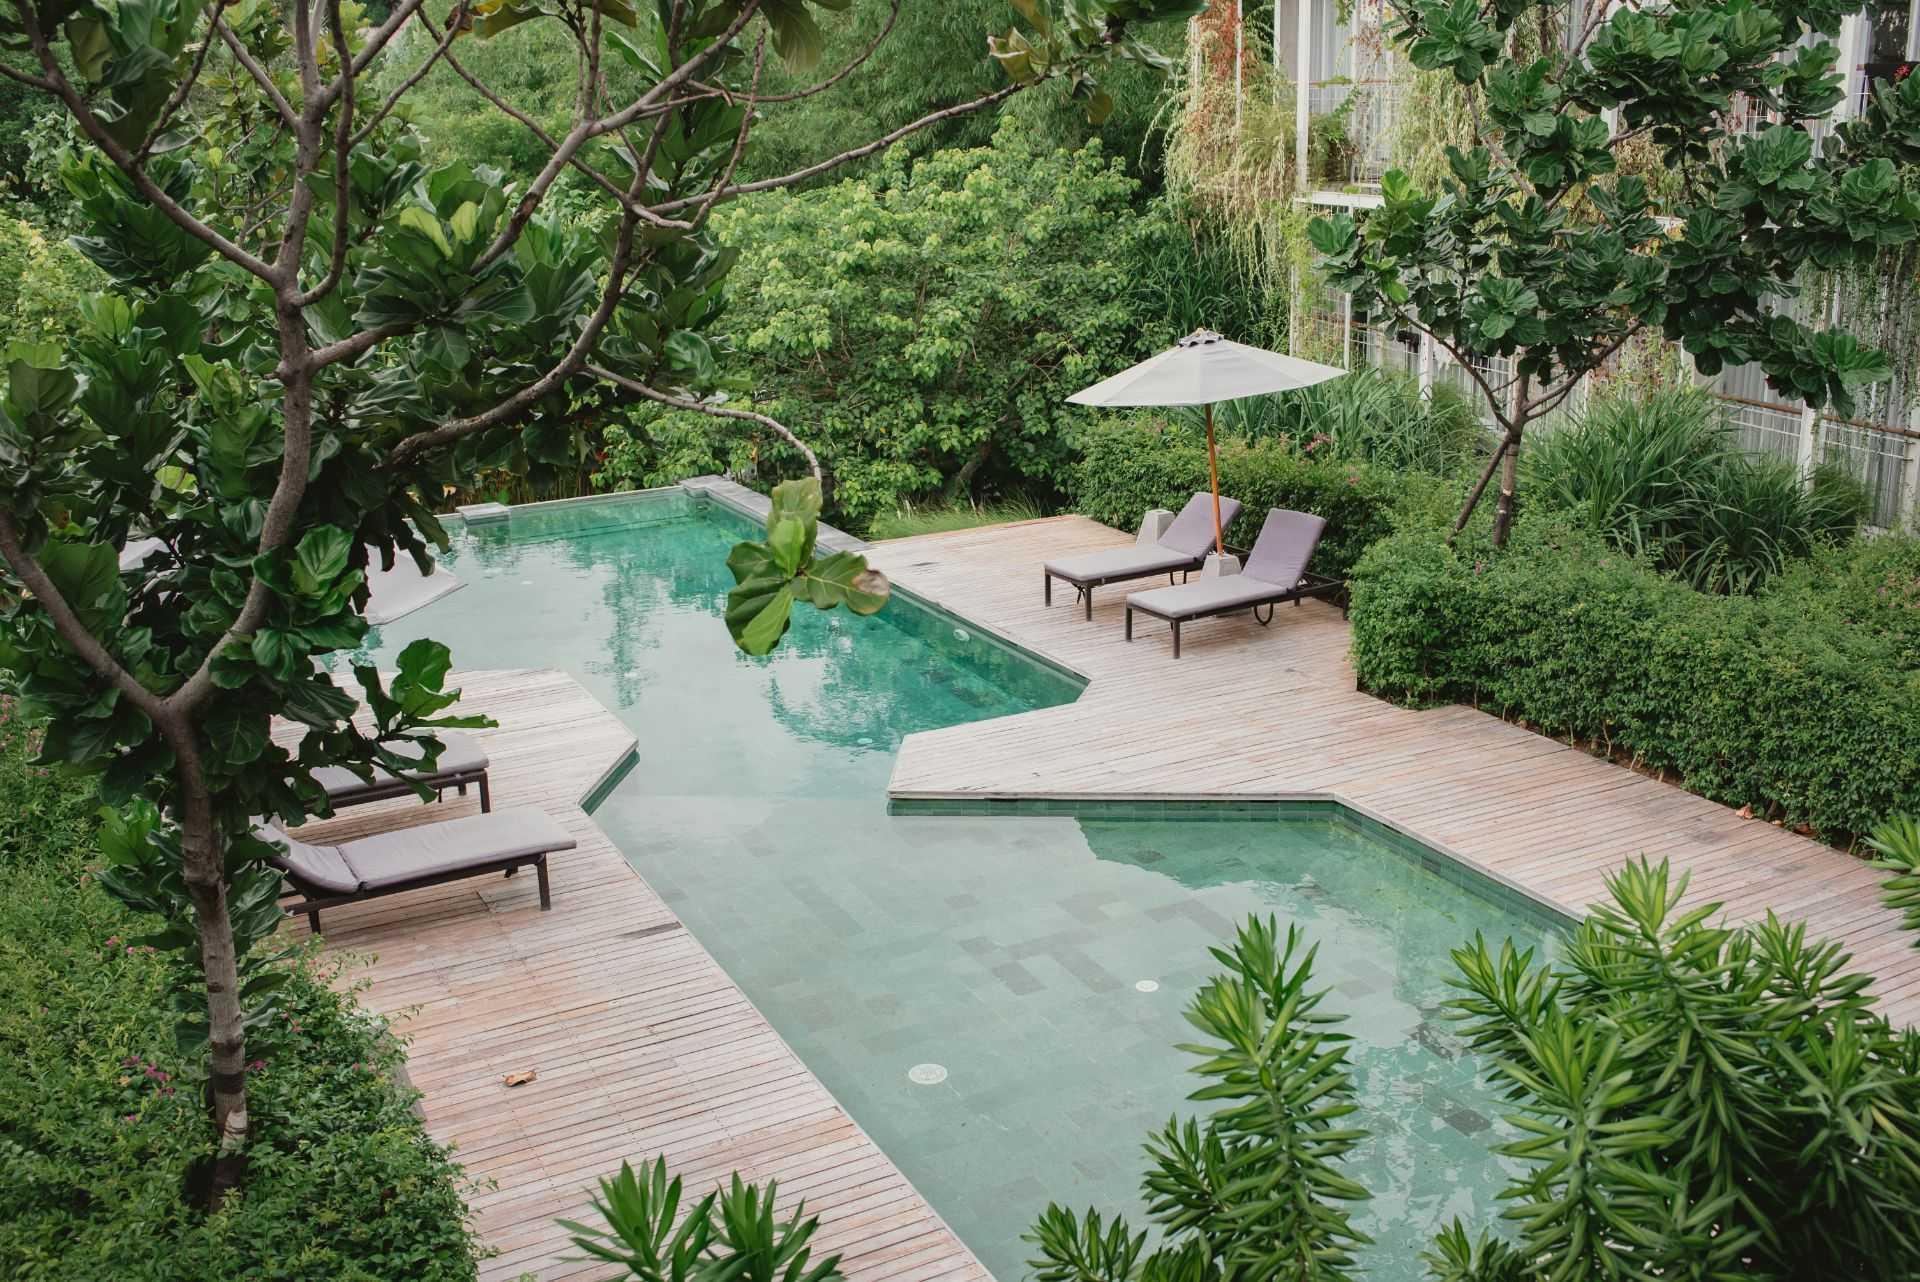 Nitkala Arsitek Rimbun Hotel Canggu, Kec. Kuta Utara, Kabupaten Badung, Bali, Indonesia Canggu, Kec. Kuta Utara, Kabupaten Badung, Bali, Indonesia Nitkala-Arsitek-Rimbun-Hotel  121612